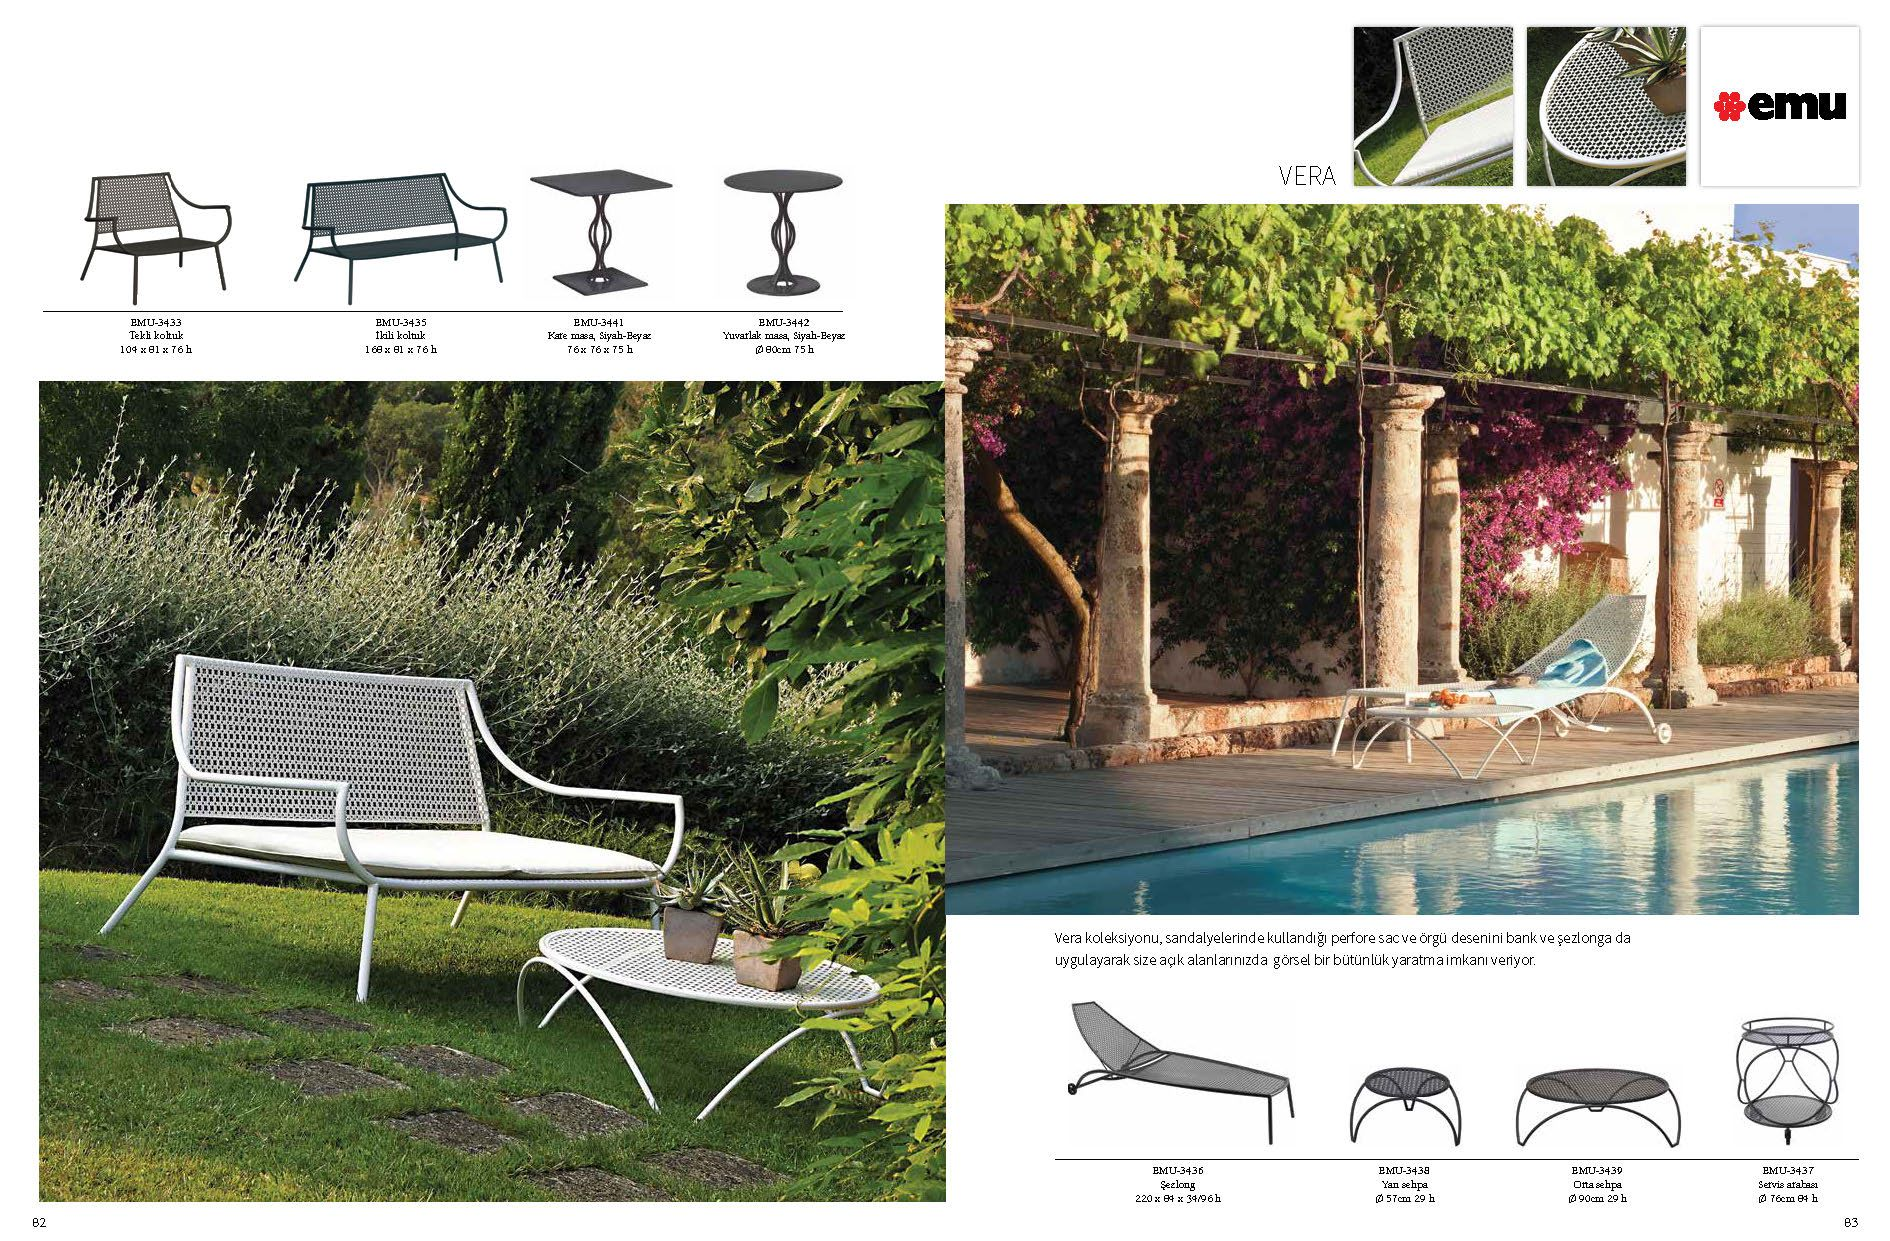 ICA 2014 Bahçe Kataloğu Outdoor furniture sets, Outdoor